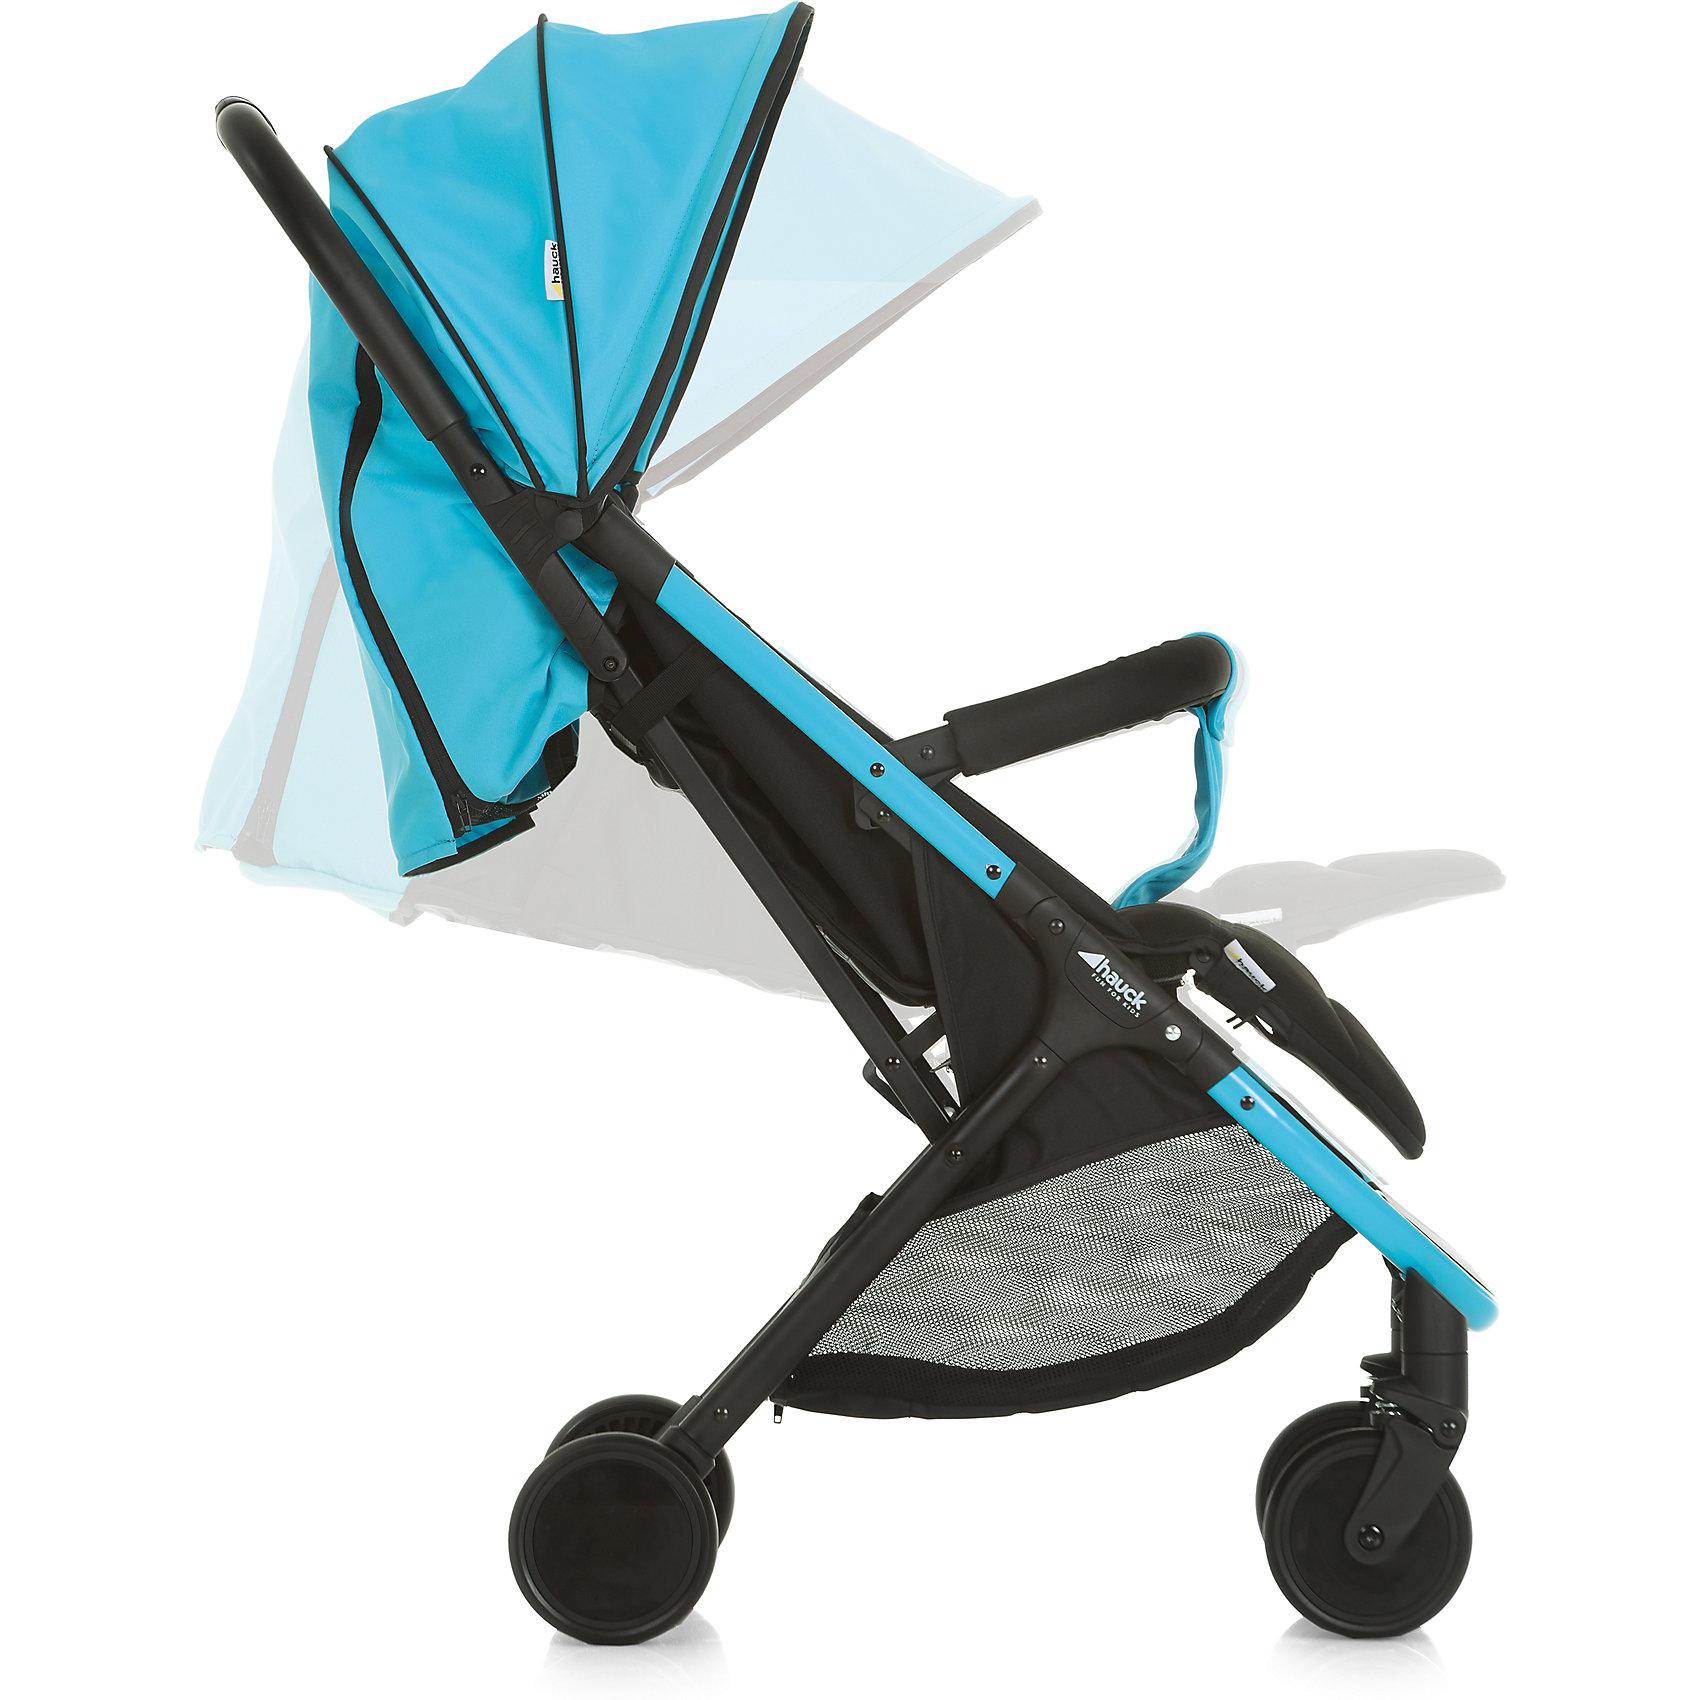 neon blue//caviar 7006155 Neu Hauck Buggy Swift Plus